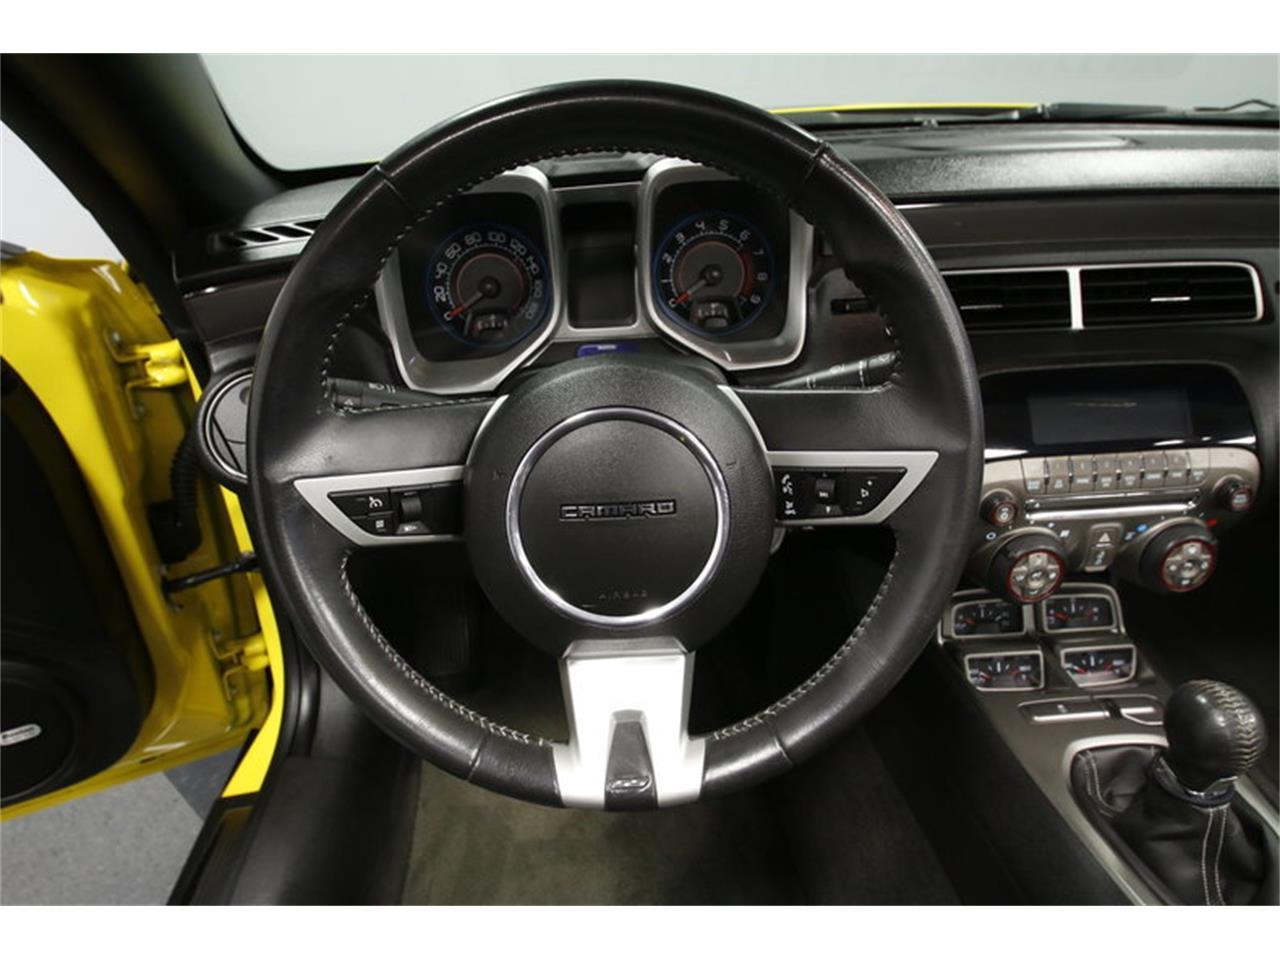 Large Picture of '11 Chevrolet Camaro - $34,995.00 - MZEP